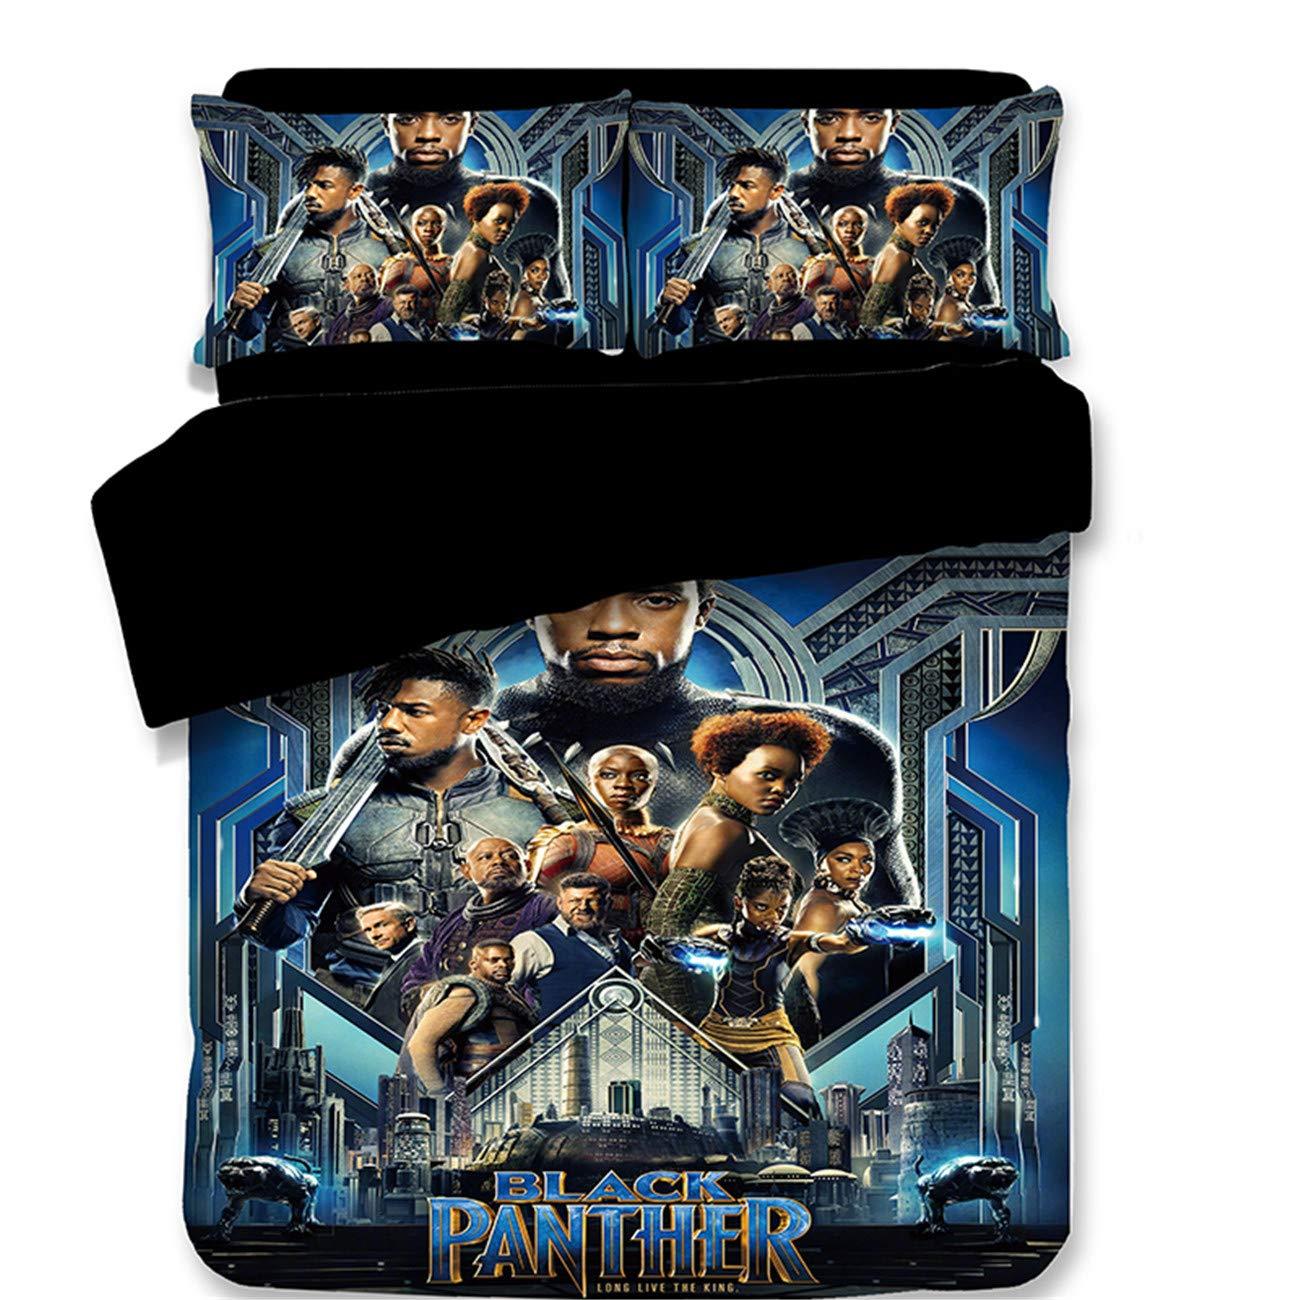 AMTAN 3D Black Panther Duvet Cover Set Kids Cartoon Bedding 3 Piece American Superhero Film Marvel Series Comics Movie Pattern Bed Sets 1Duvet Cover 2Pillowshams King Queen Full Twin Size